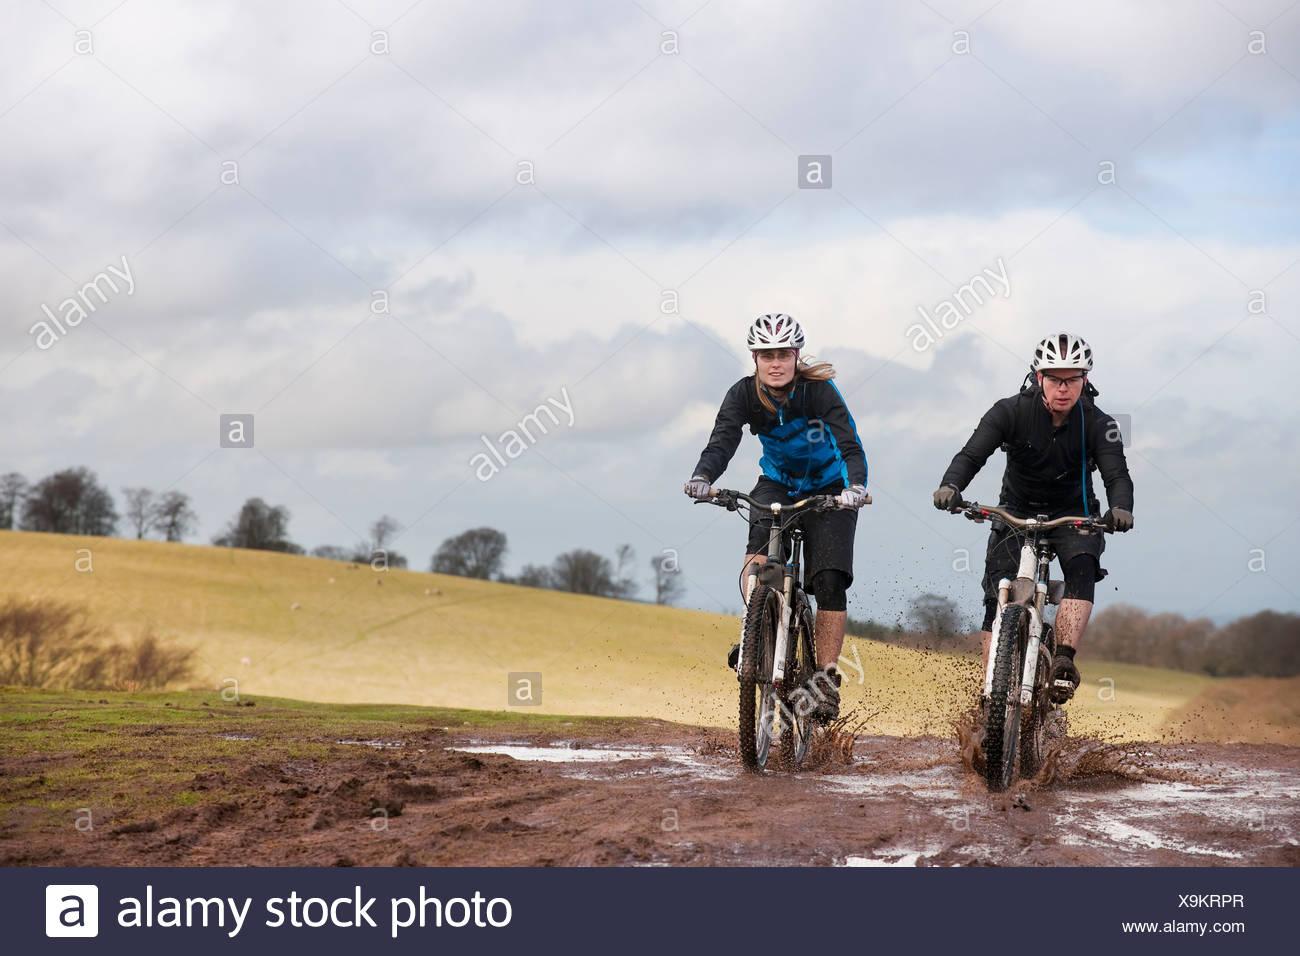 Couple riding bike through muddy puddles - Stock Image